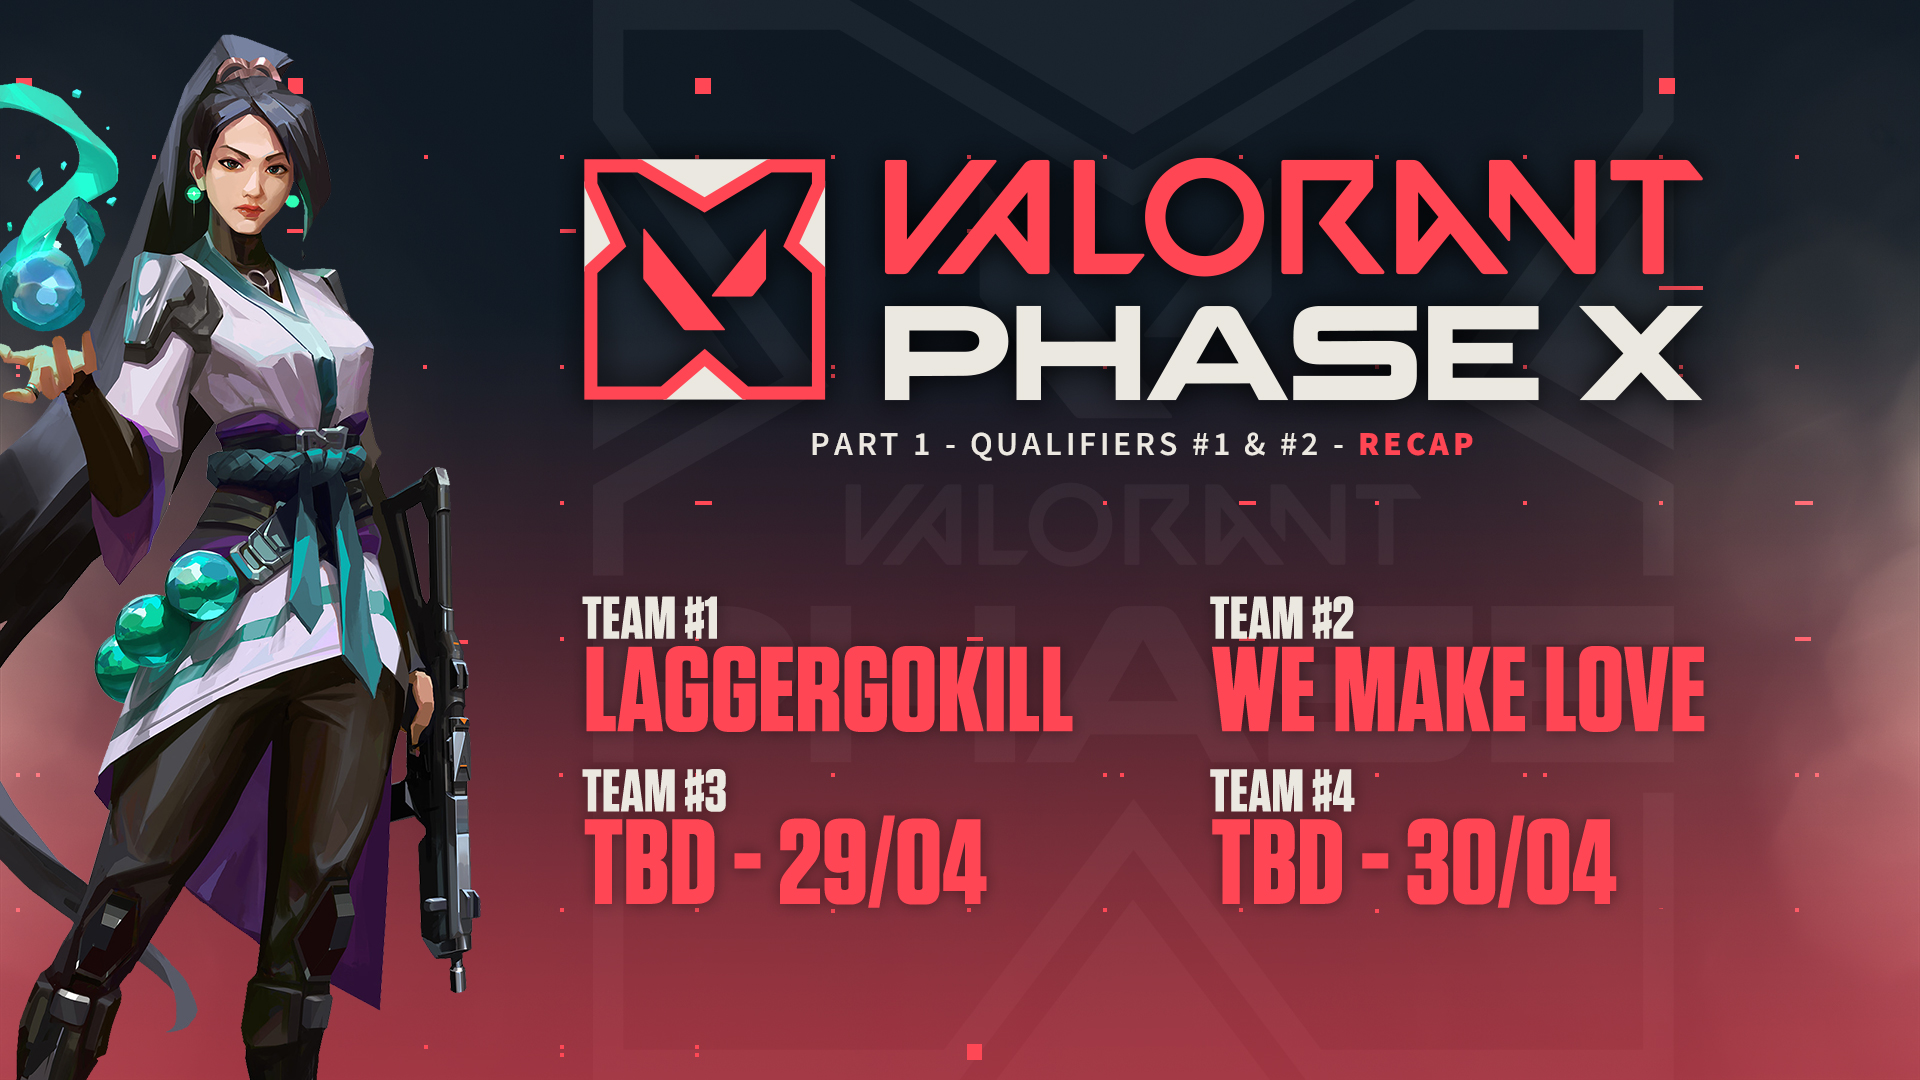 VALORANT LEGENDS Phase X Part #1 – Qualifiers #1-2 Recap